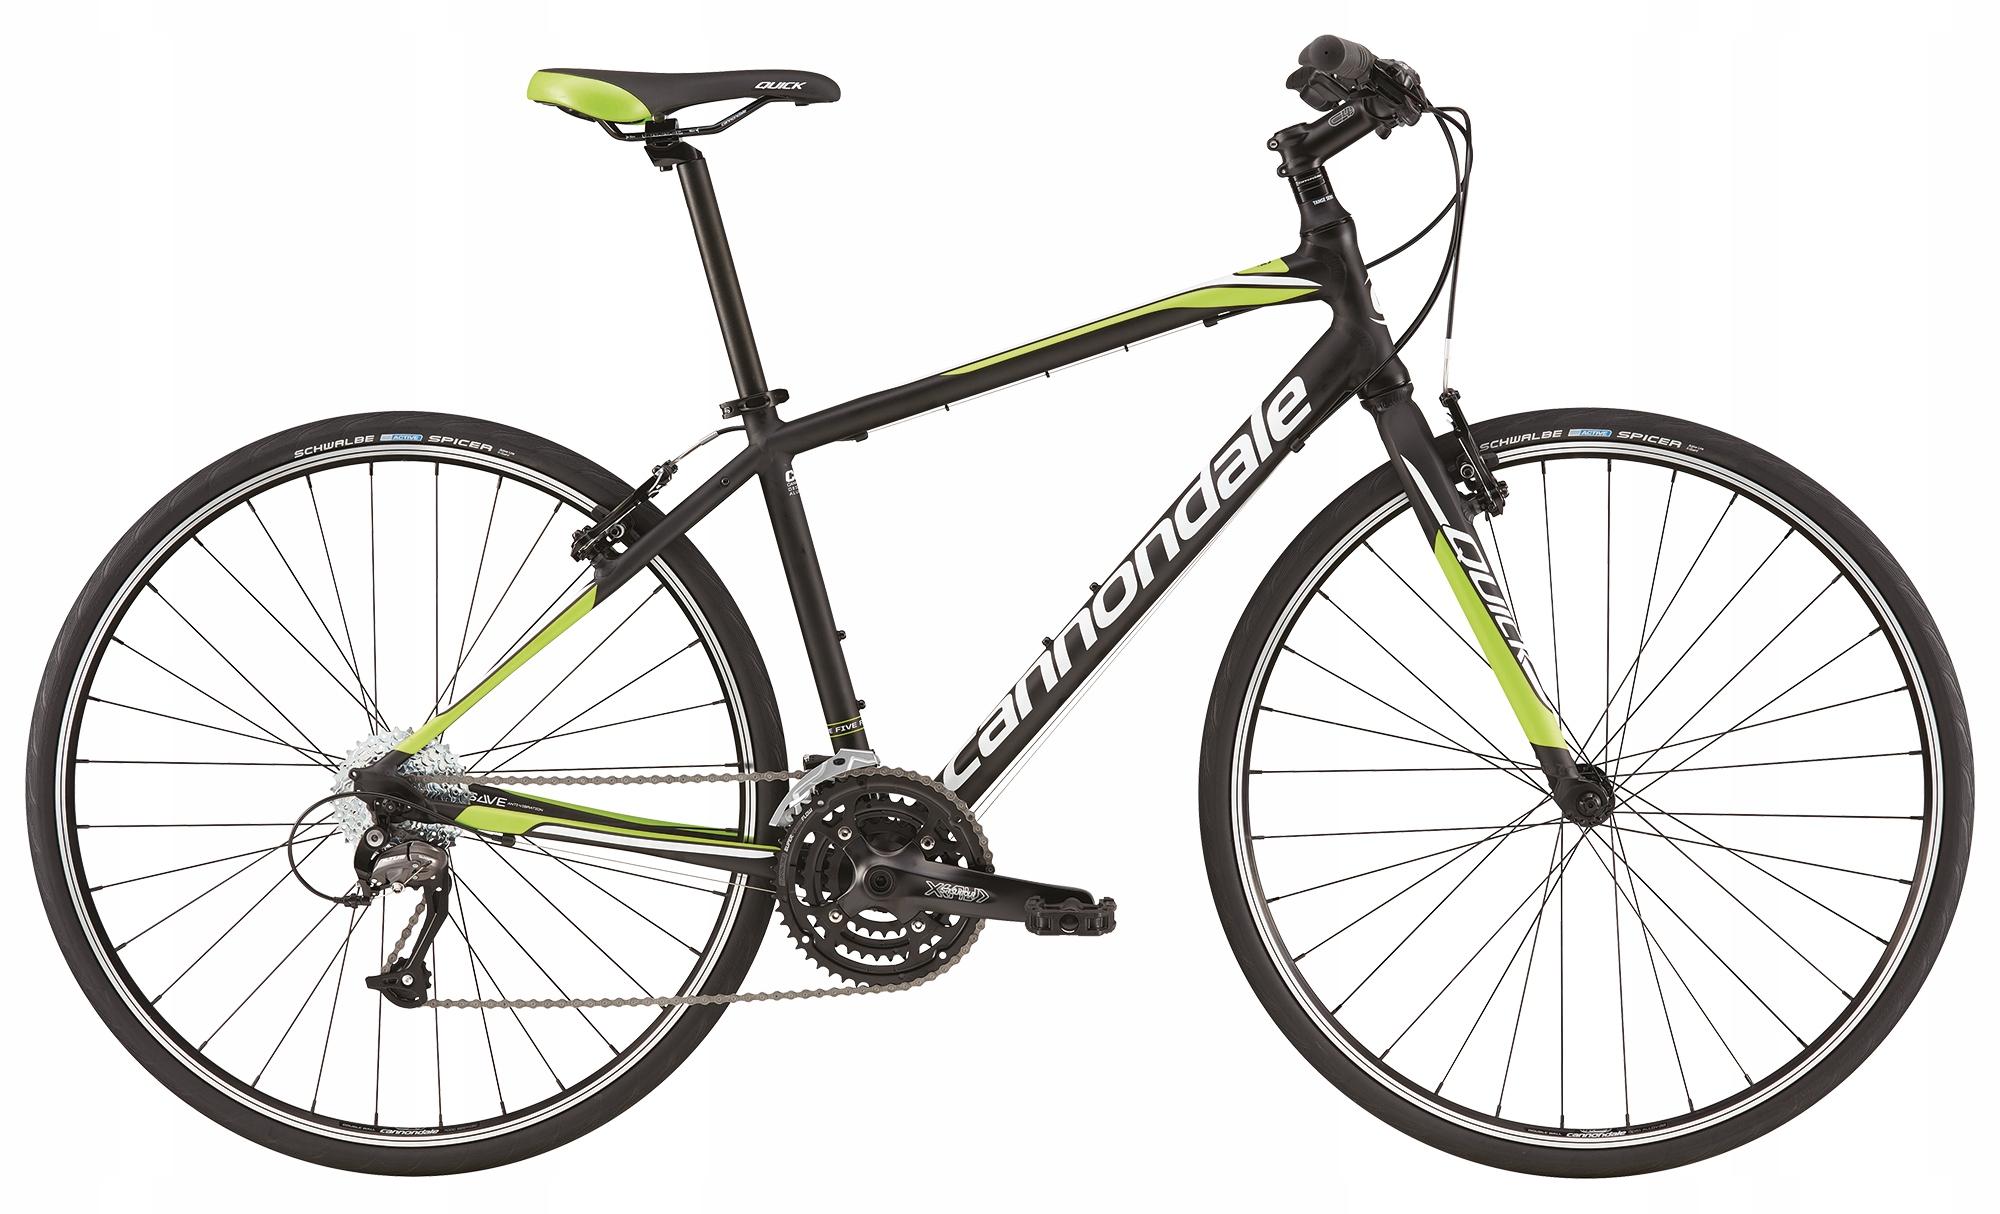 Rower Trekingowy Cannondale Quick 5 XL -50%